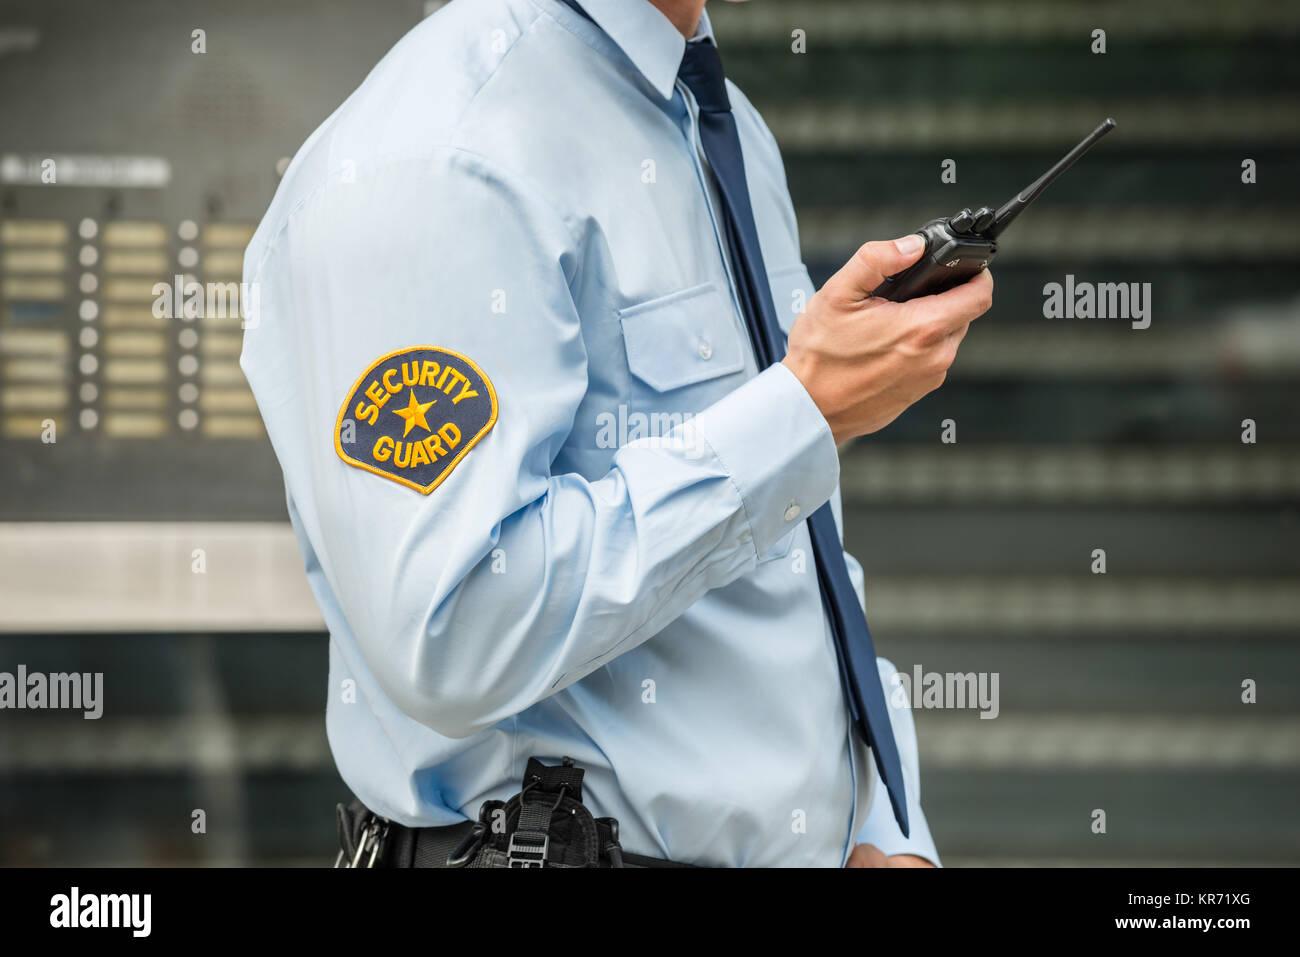 Security Guard Using Walkie-talkie - Stock Image